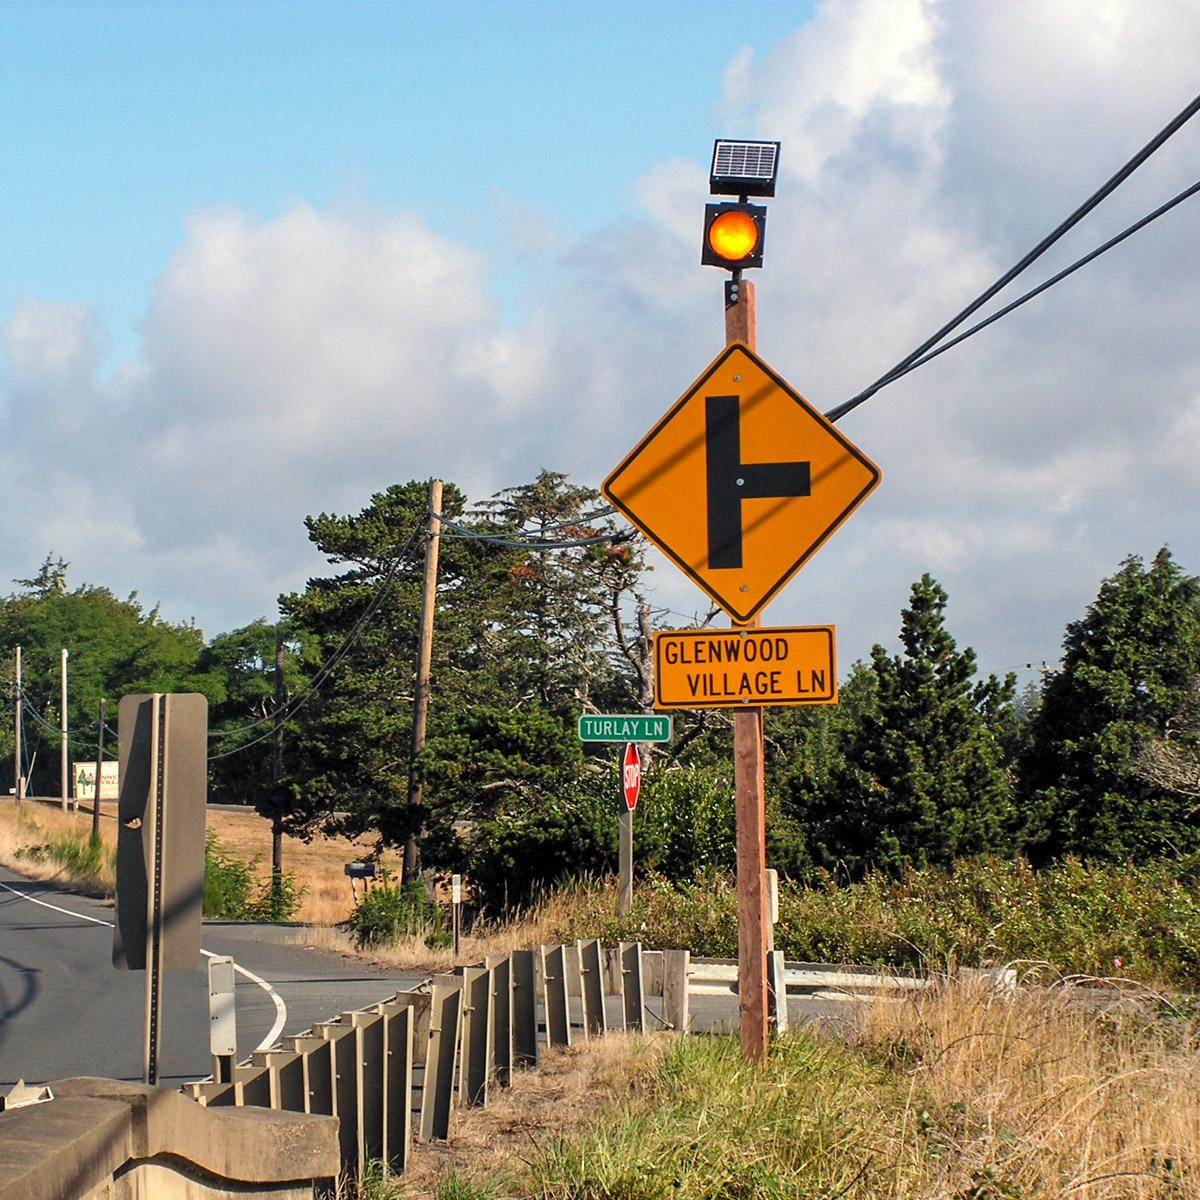 solar-powered warning sign flashing beacon on sign